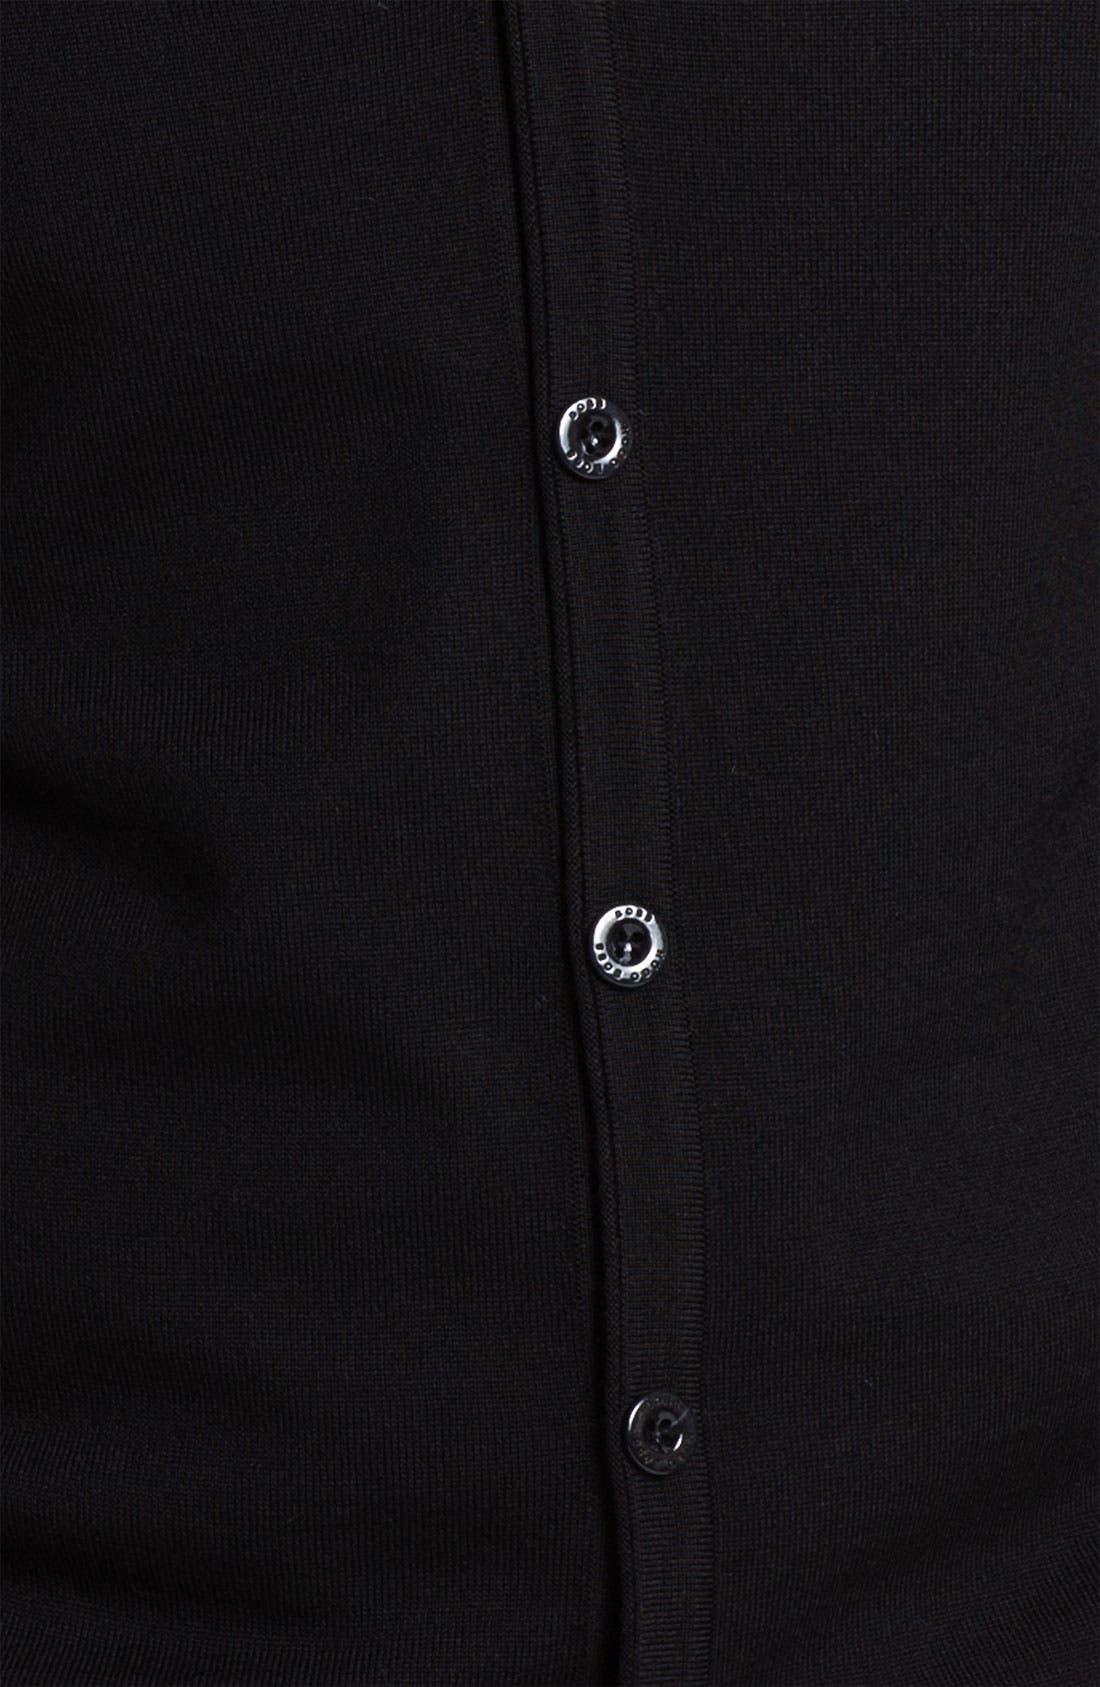 Black 'Baltimore' Wool Button Cardigan,                             Alternate thumbnail 3, color,                             001